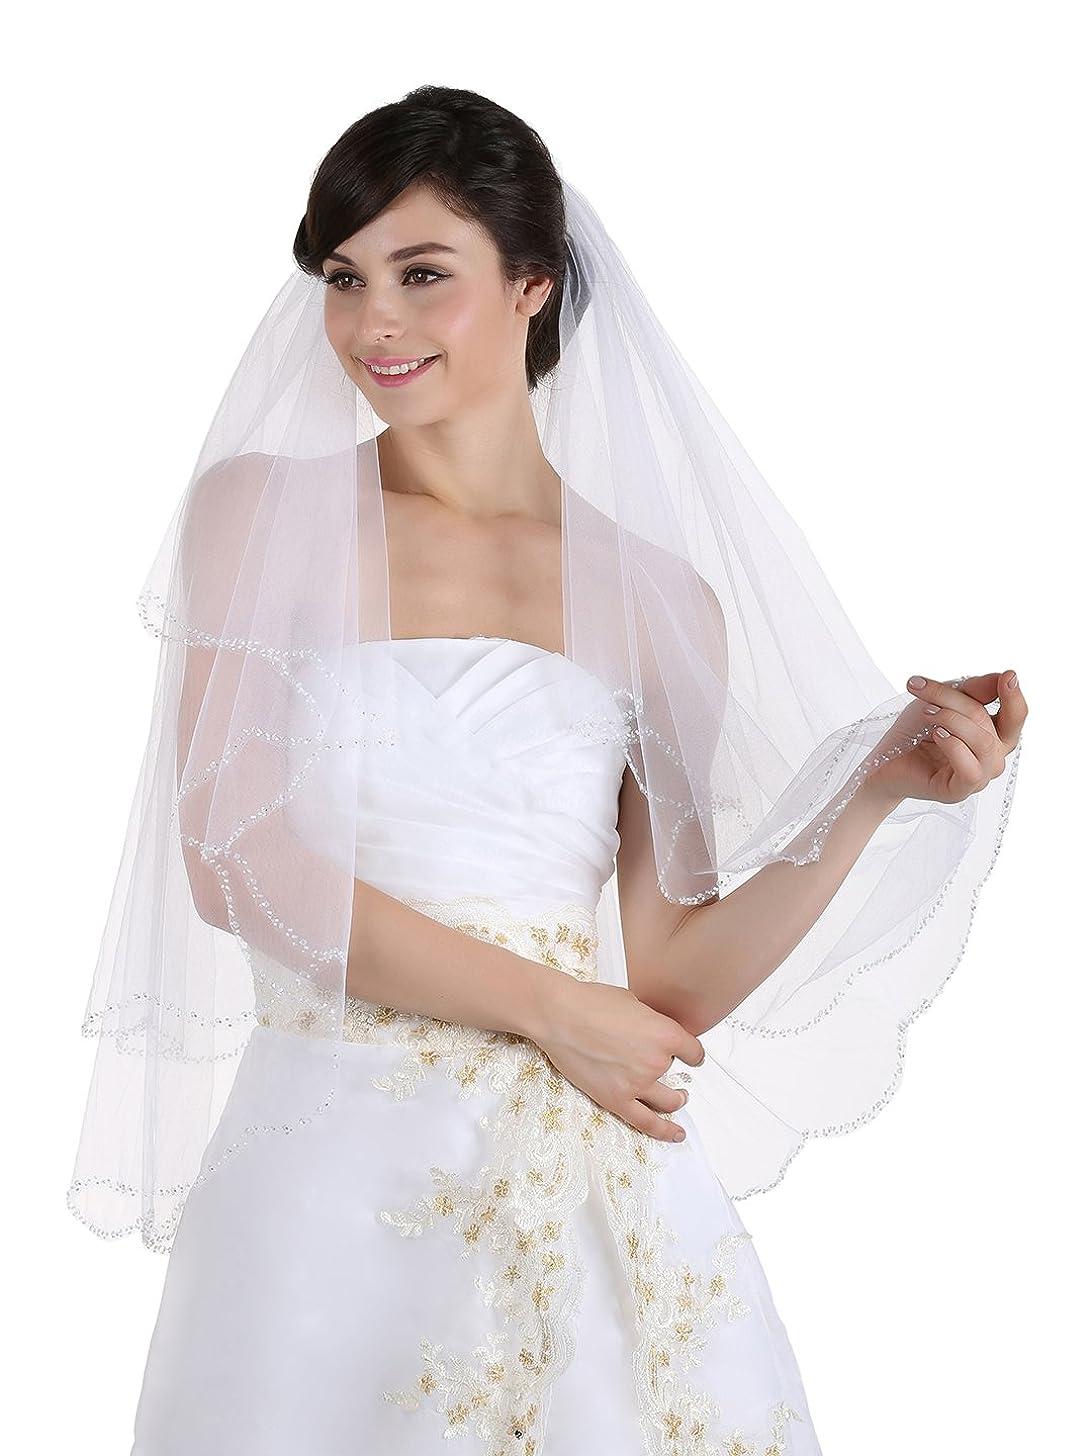 2T 2 Tier Beaded Scallop Edge Bridal Veil Fingertip Length 36